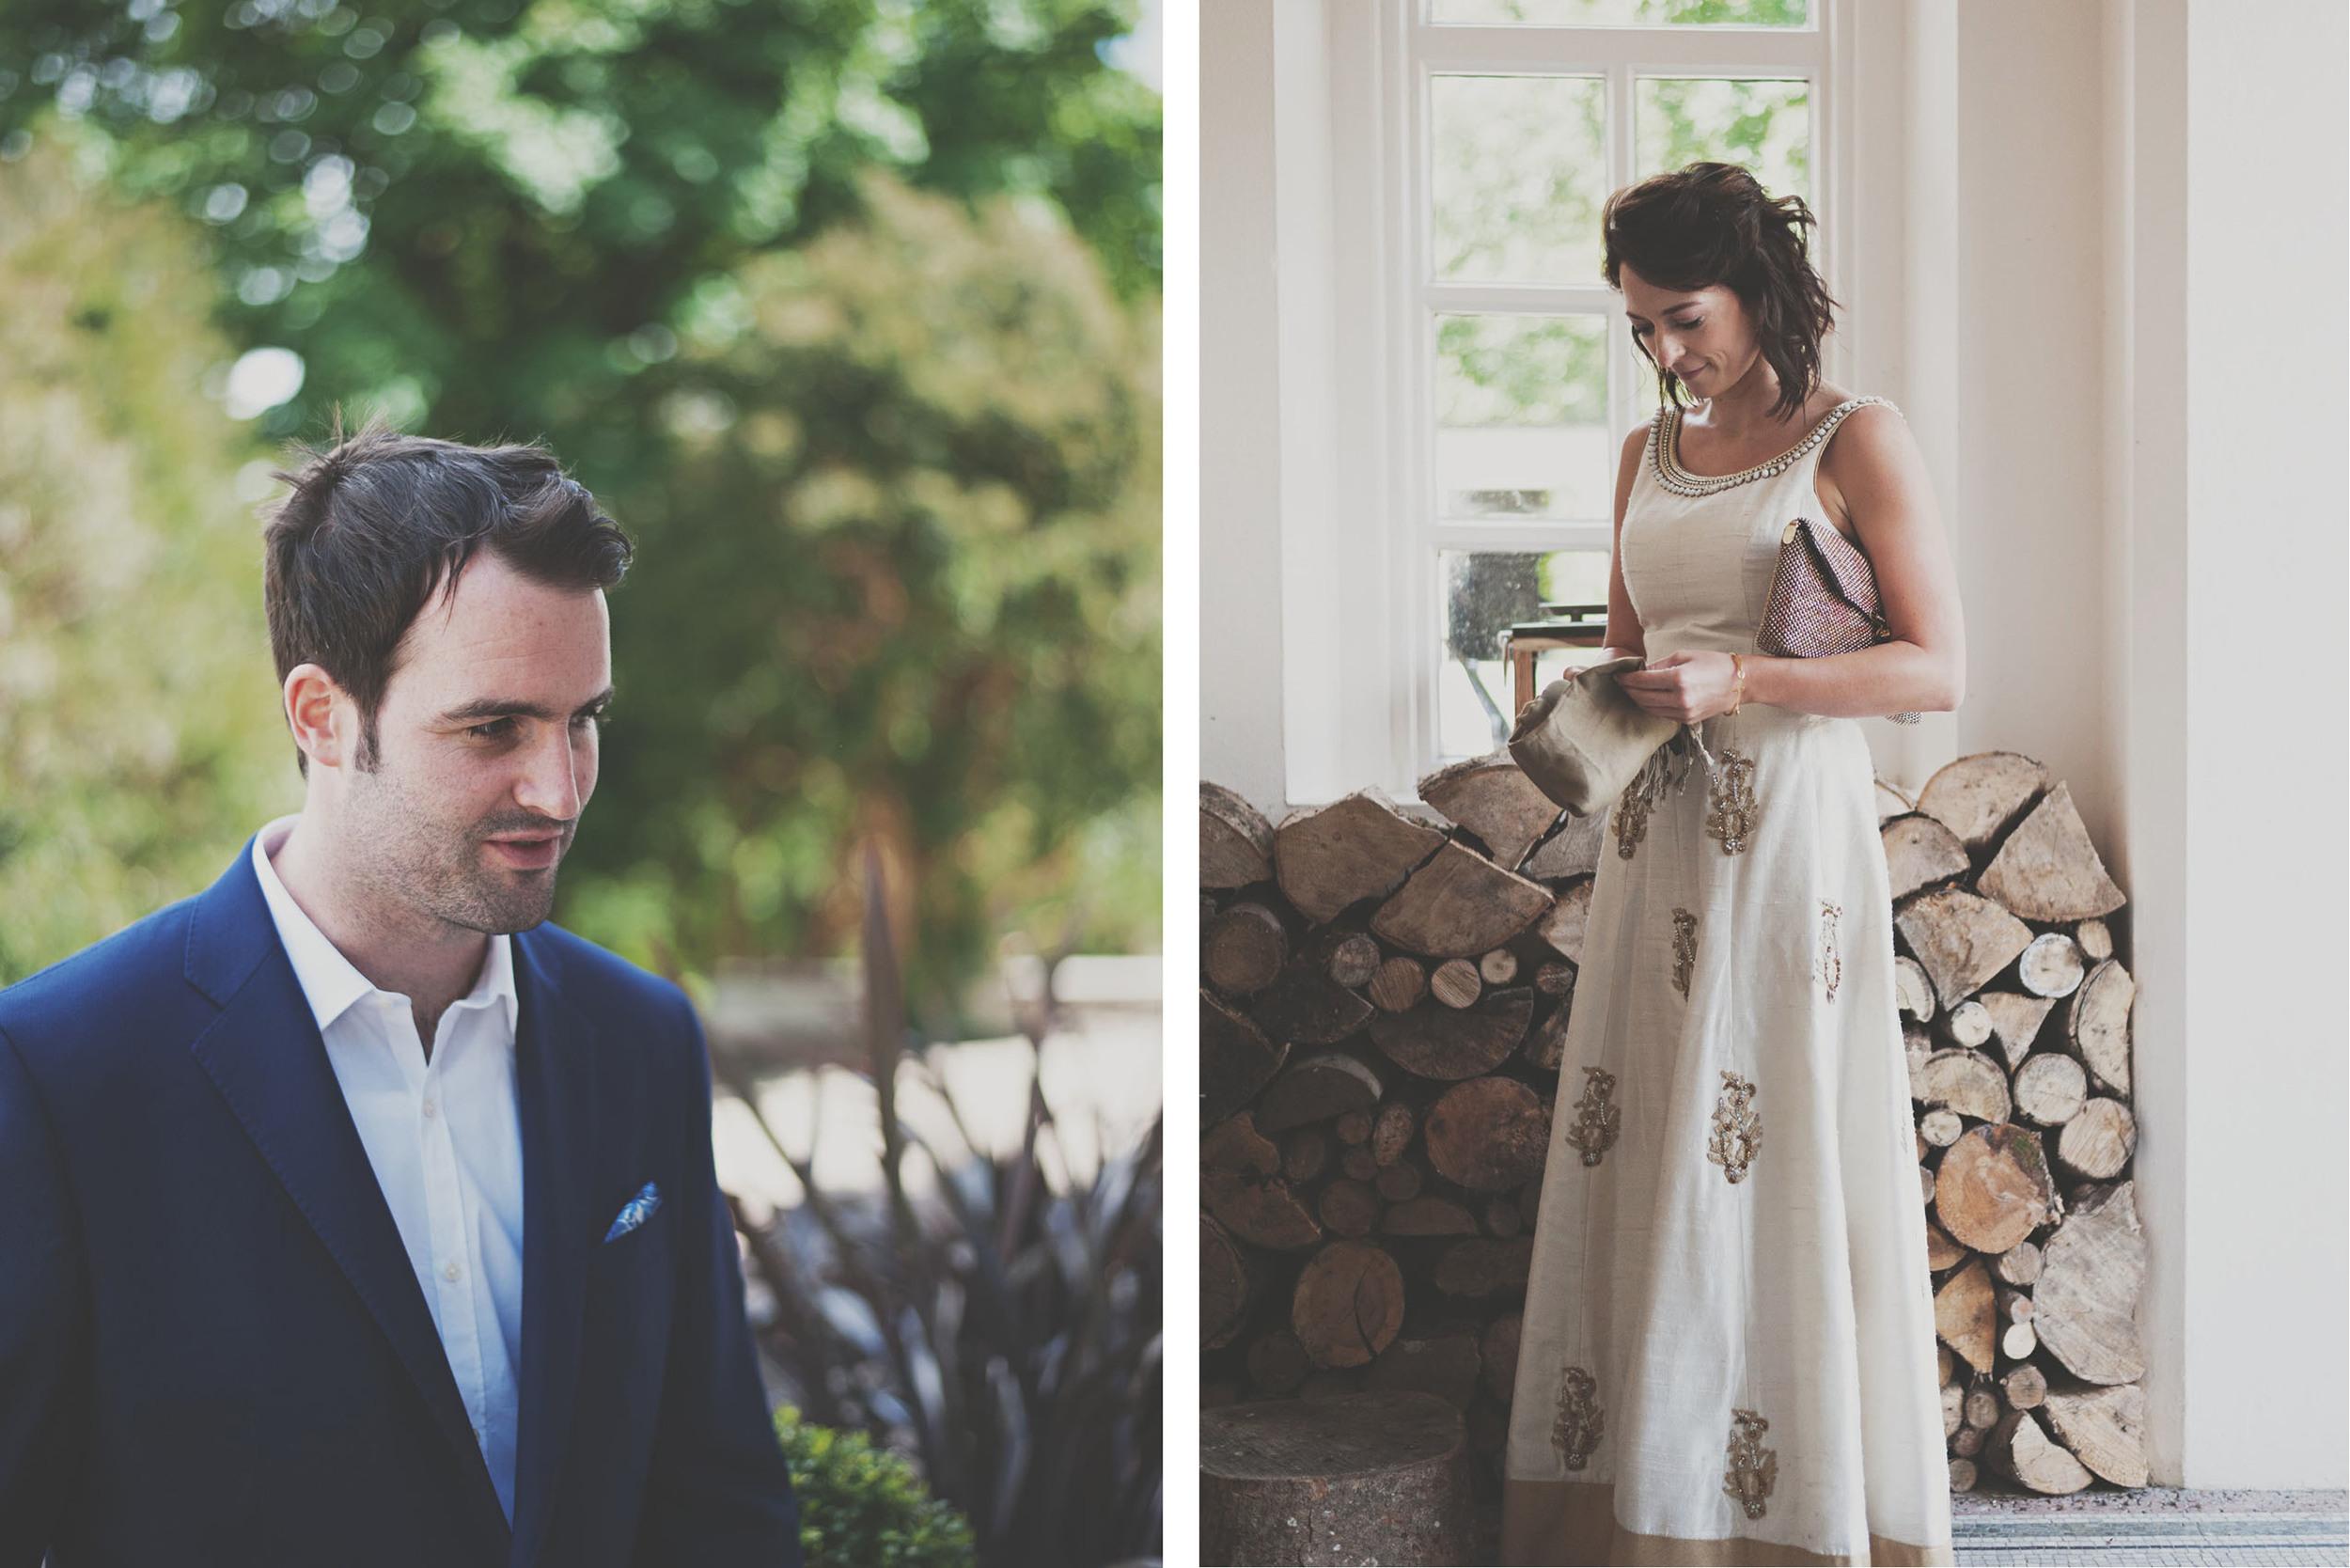 Catherine & David's Dromquinna wedding 015.jpg